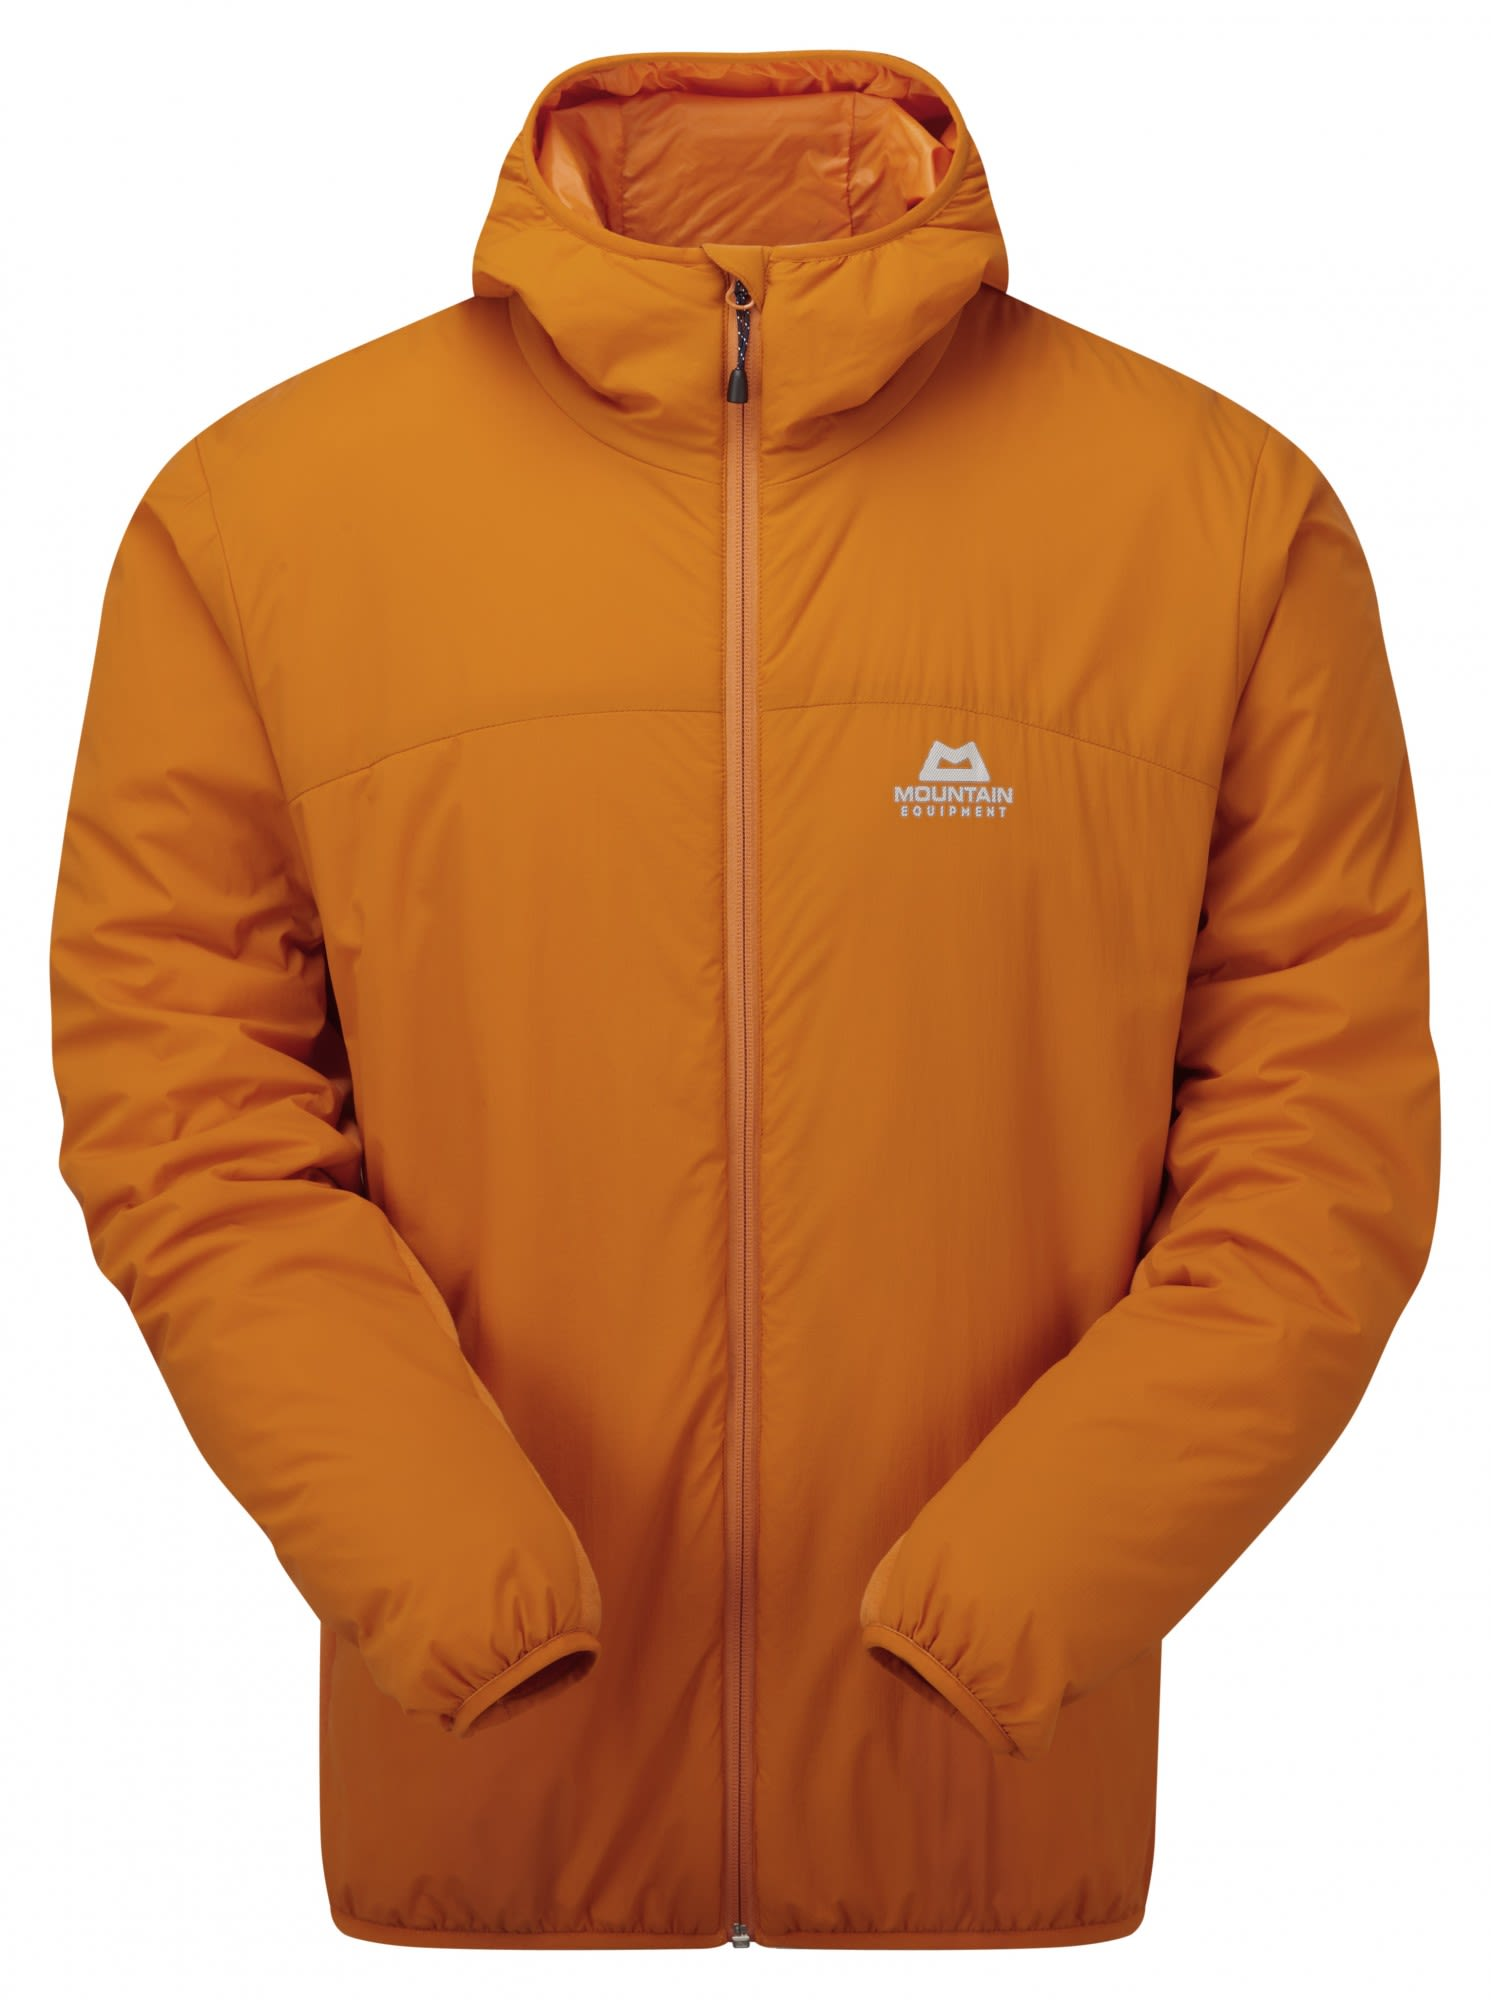 Mountain Equipment M Transition Jacket (Modell Sommer 2018) | Größe S,XL | Her